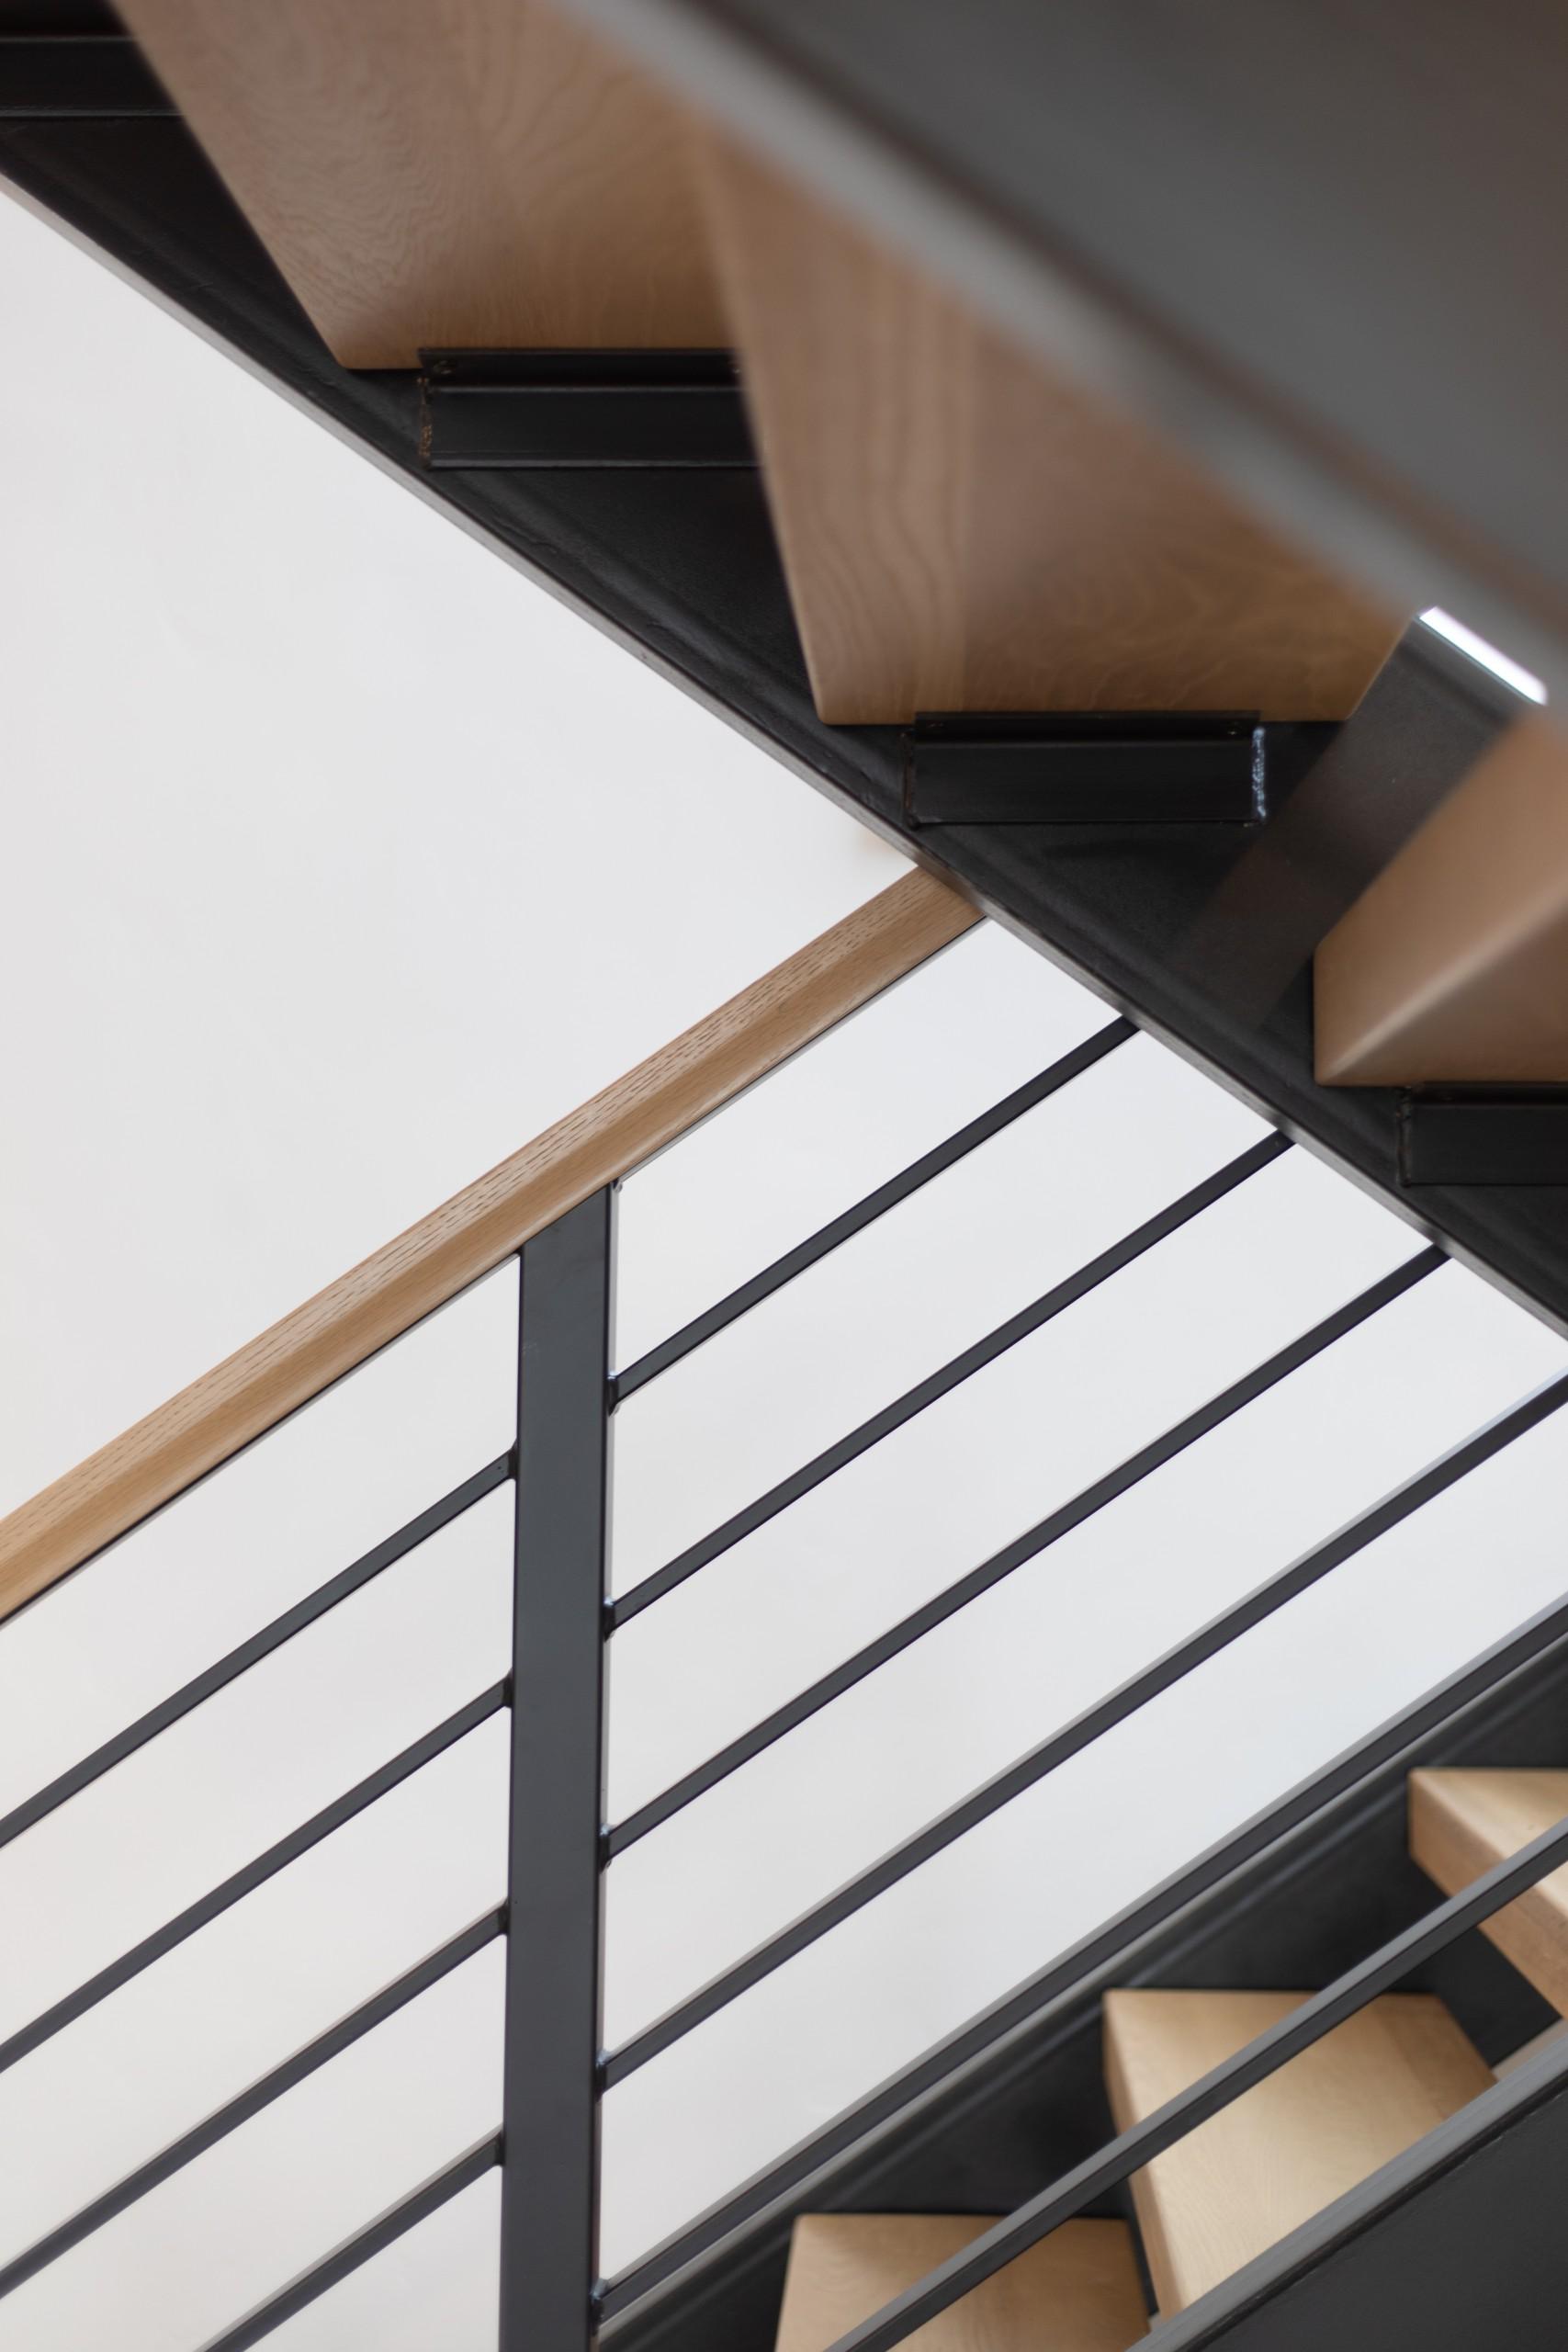 Interior Photography: Stairway Detail 1